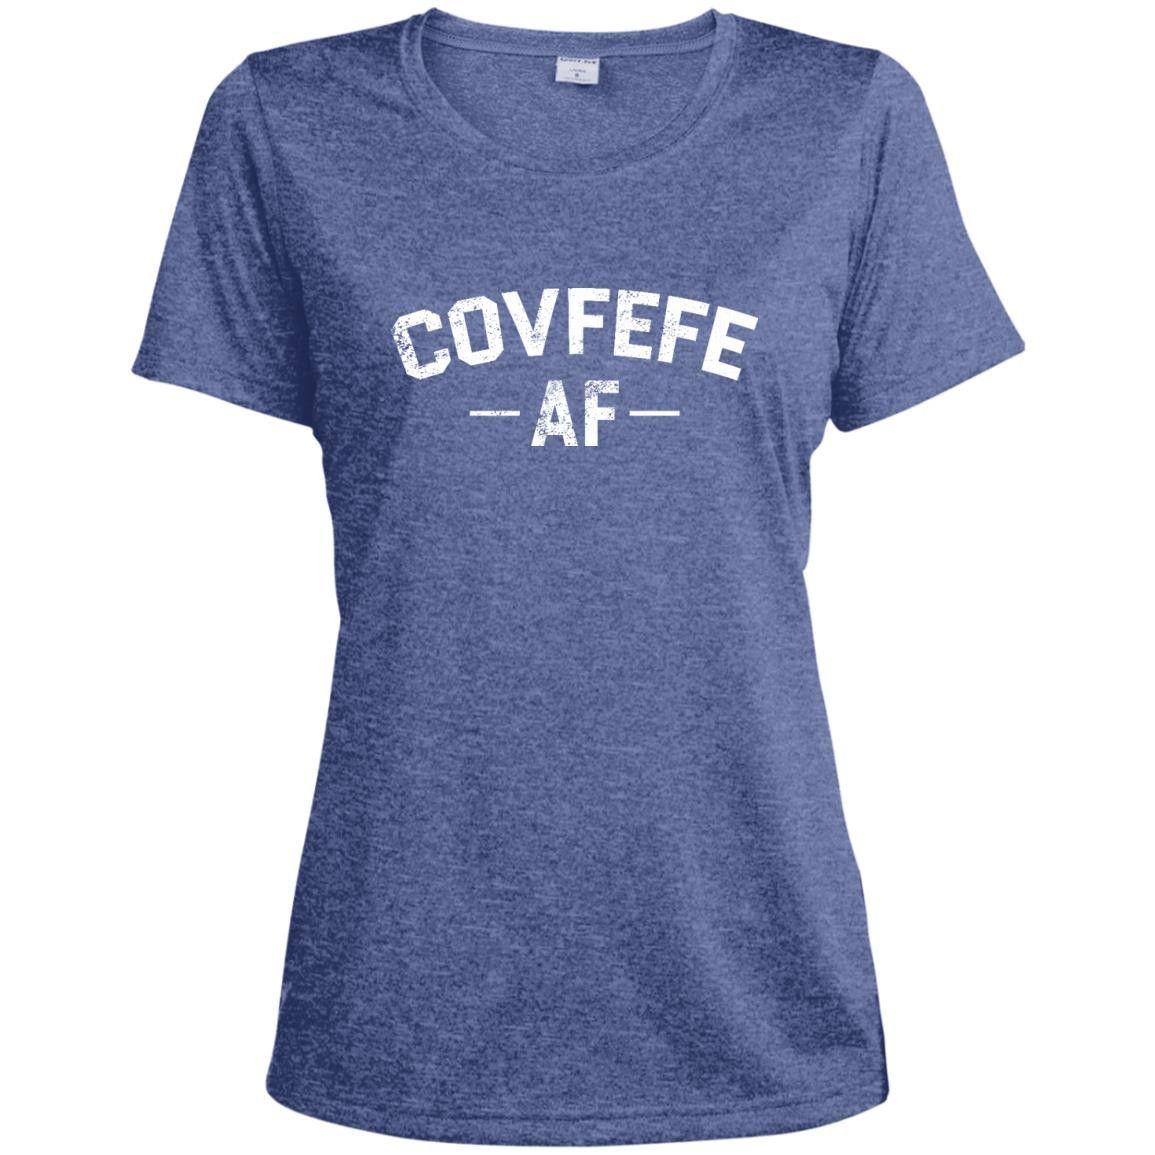 Covfefe AF LST360 Sport-Tek Ladies' Heather Dri-Fit Moisture-Wicking T-Shirt